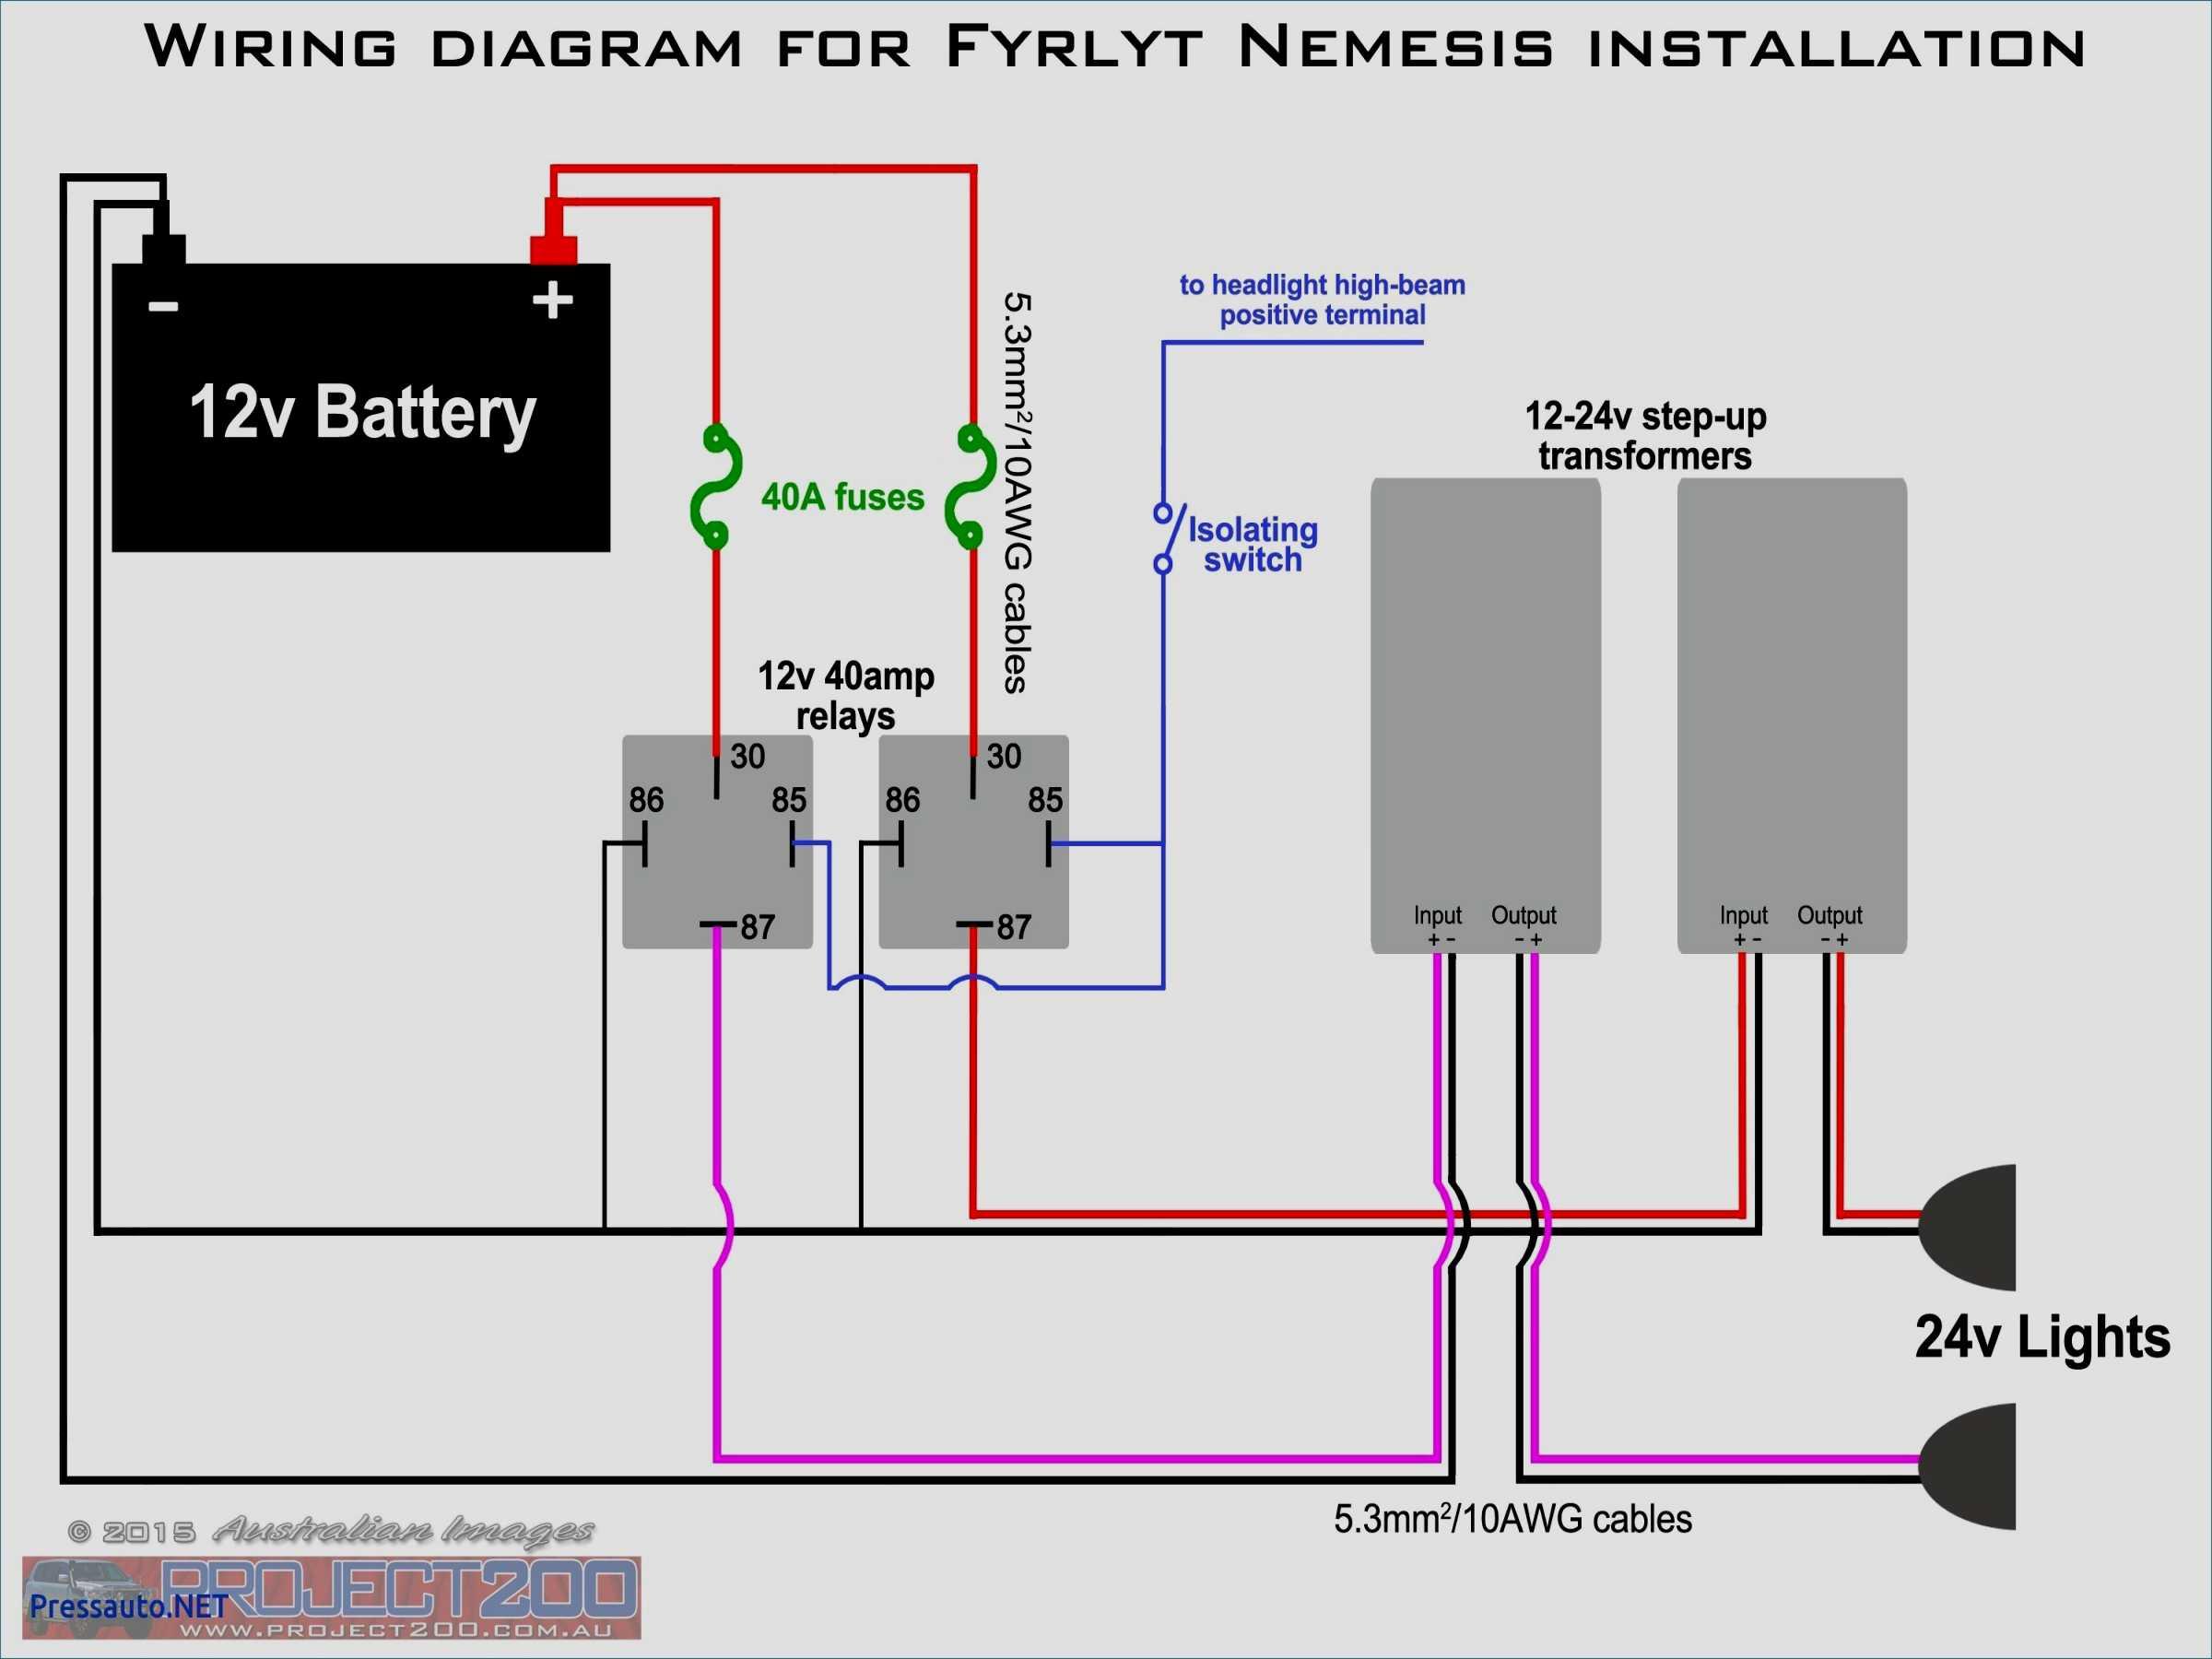 Whelen Edge 9000 Light Bar Wiring Diagram | Manual E-Books - Whelen Edge 9000 Wiring Diagram